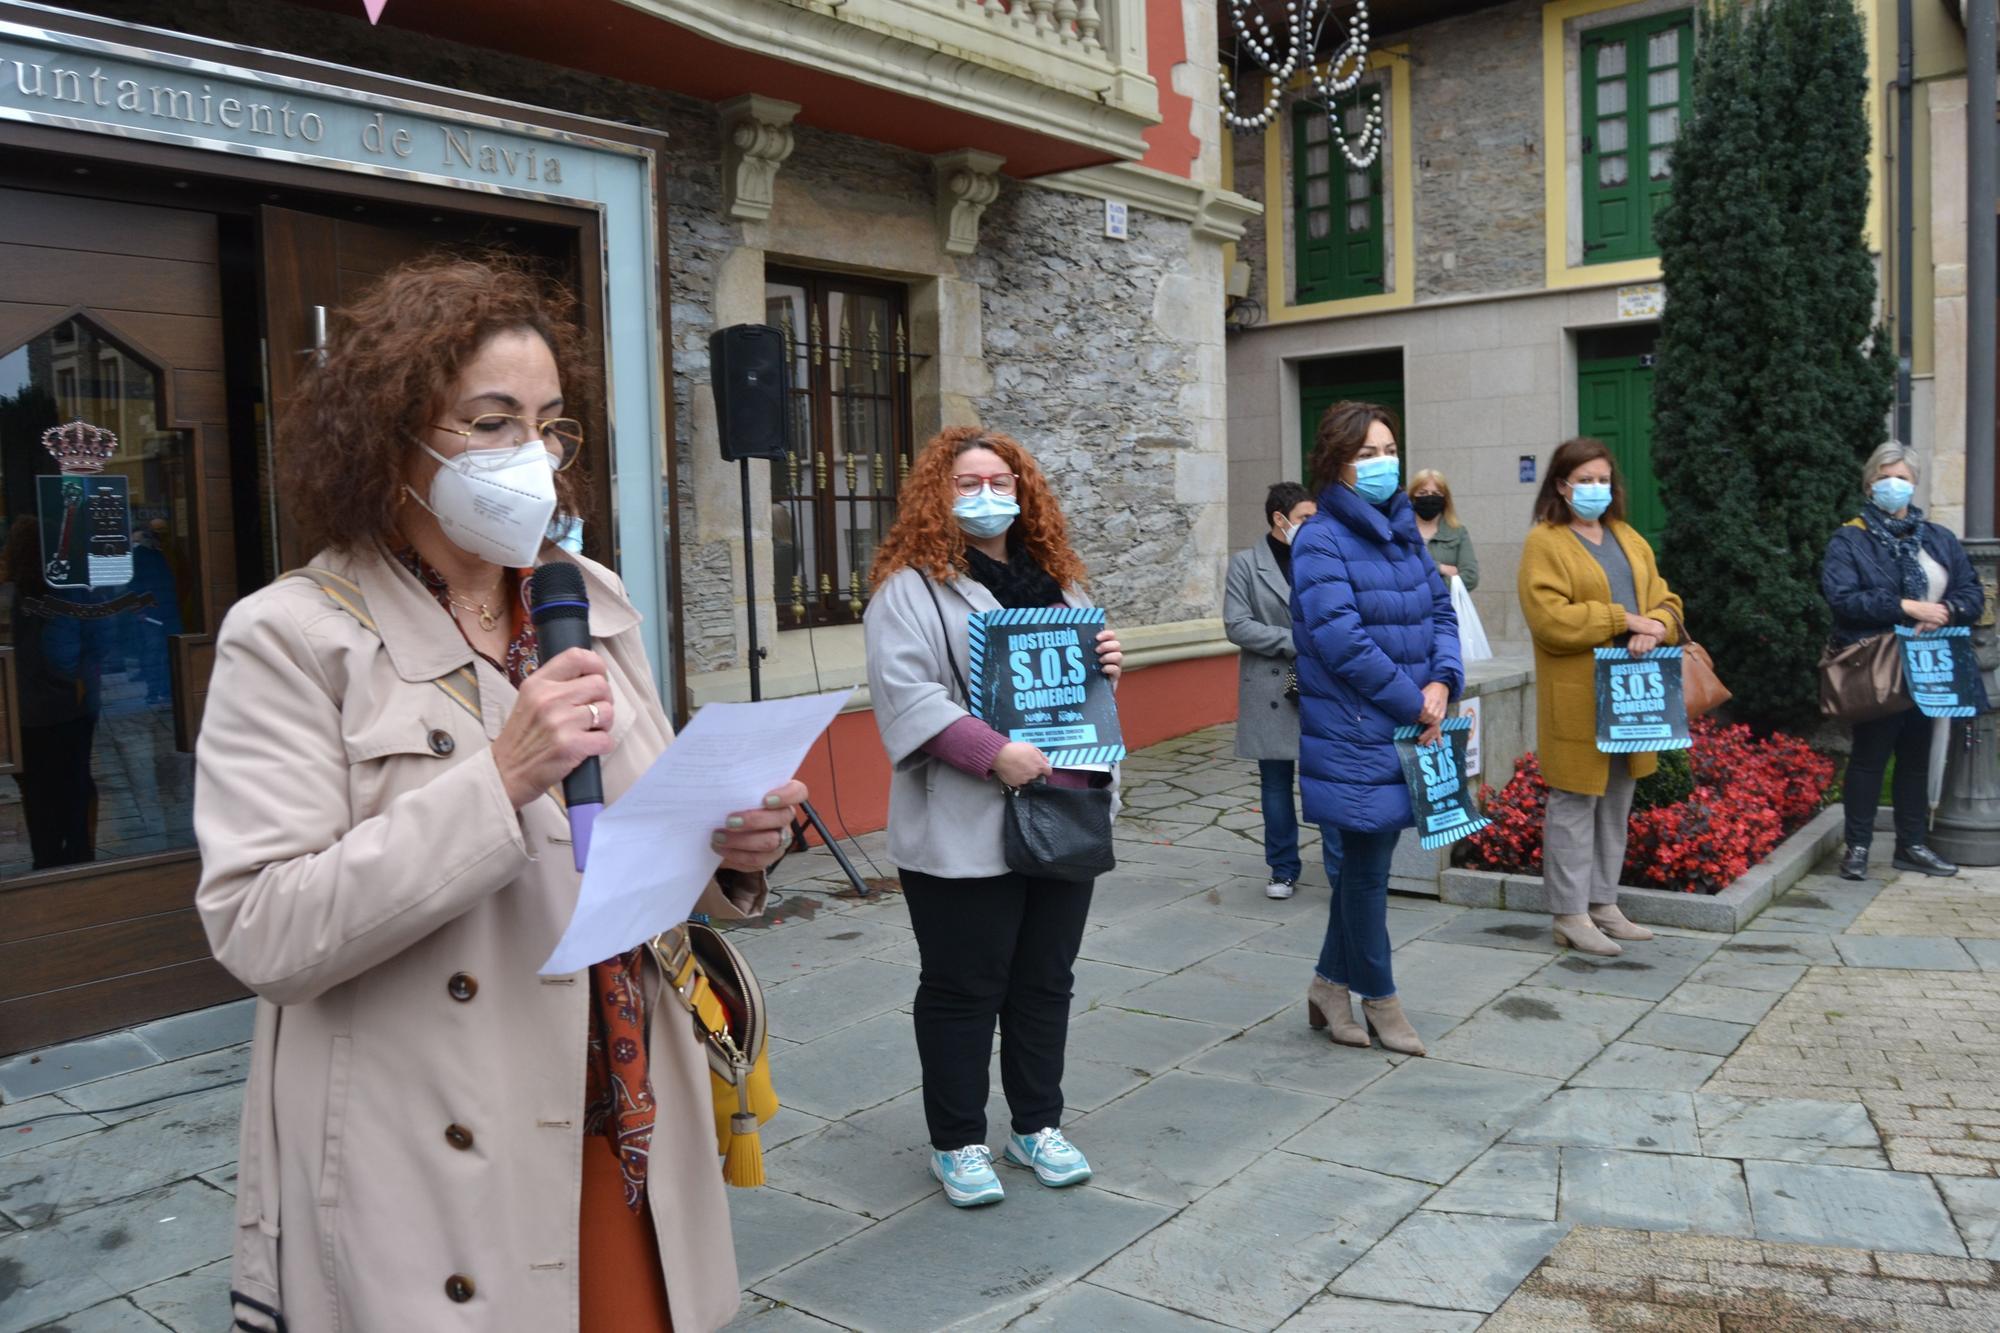 protestas en Navia 3.jpg